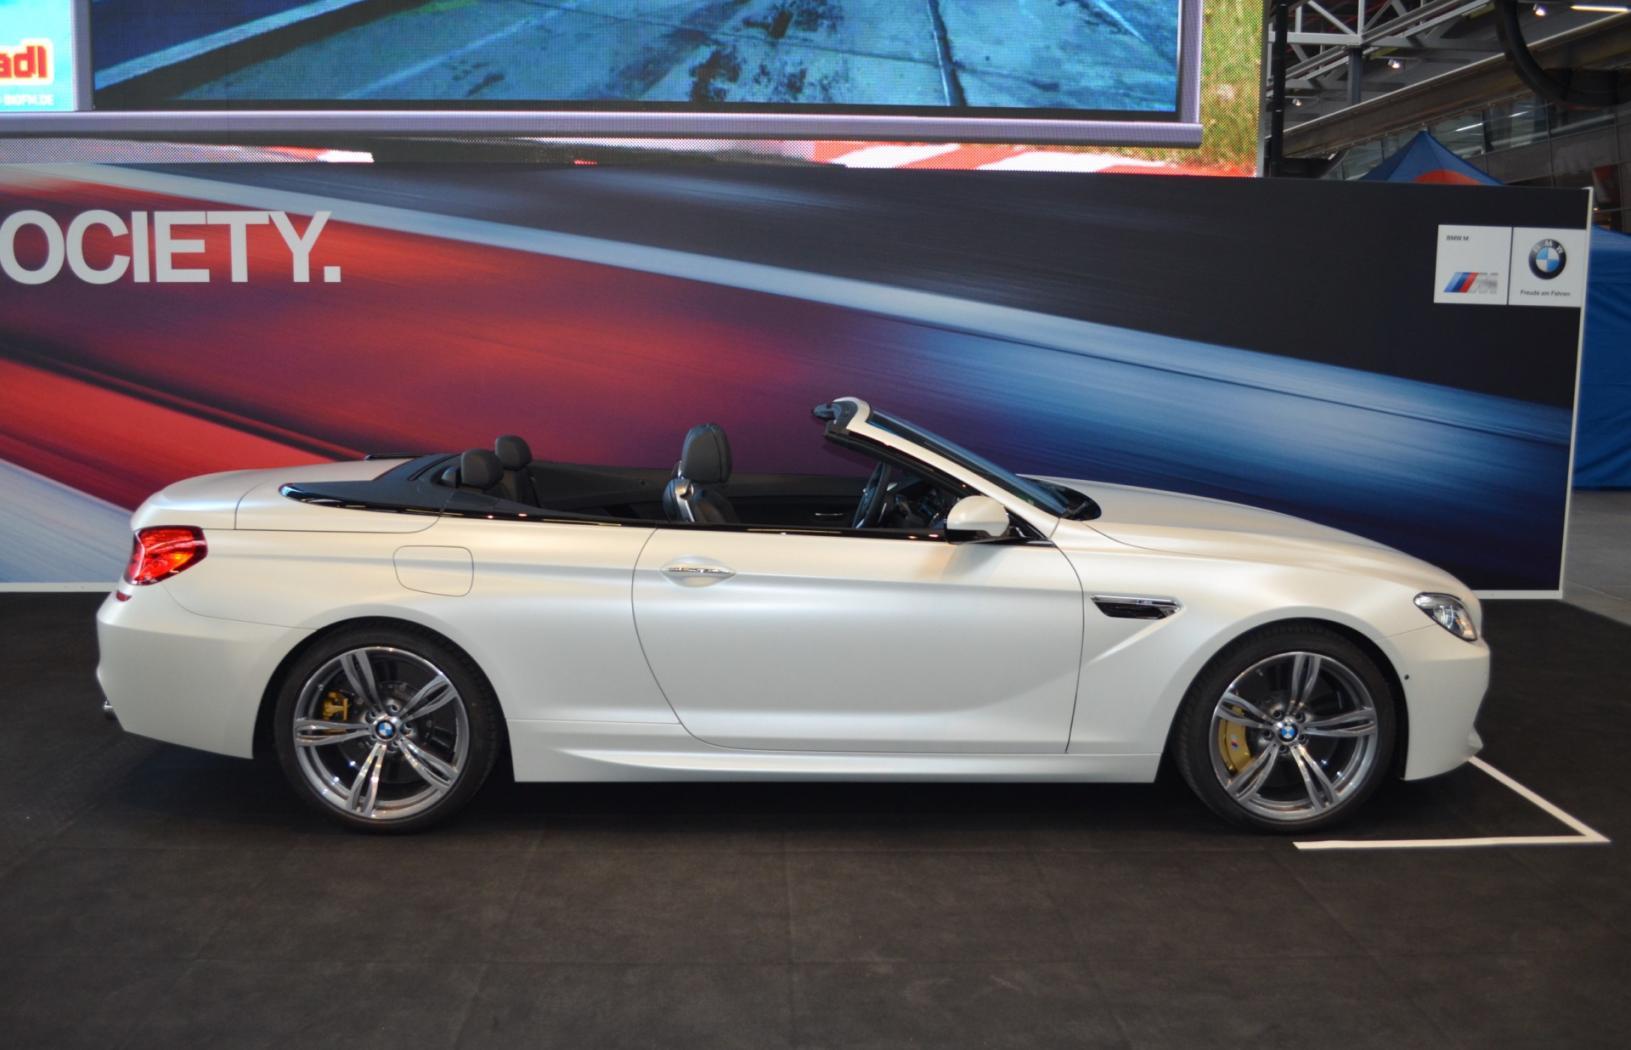 Fiche-occasion-BMW-M6-F12-1.jpeg